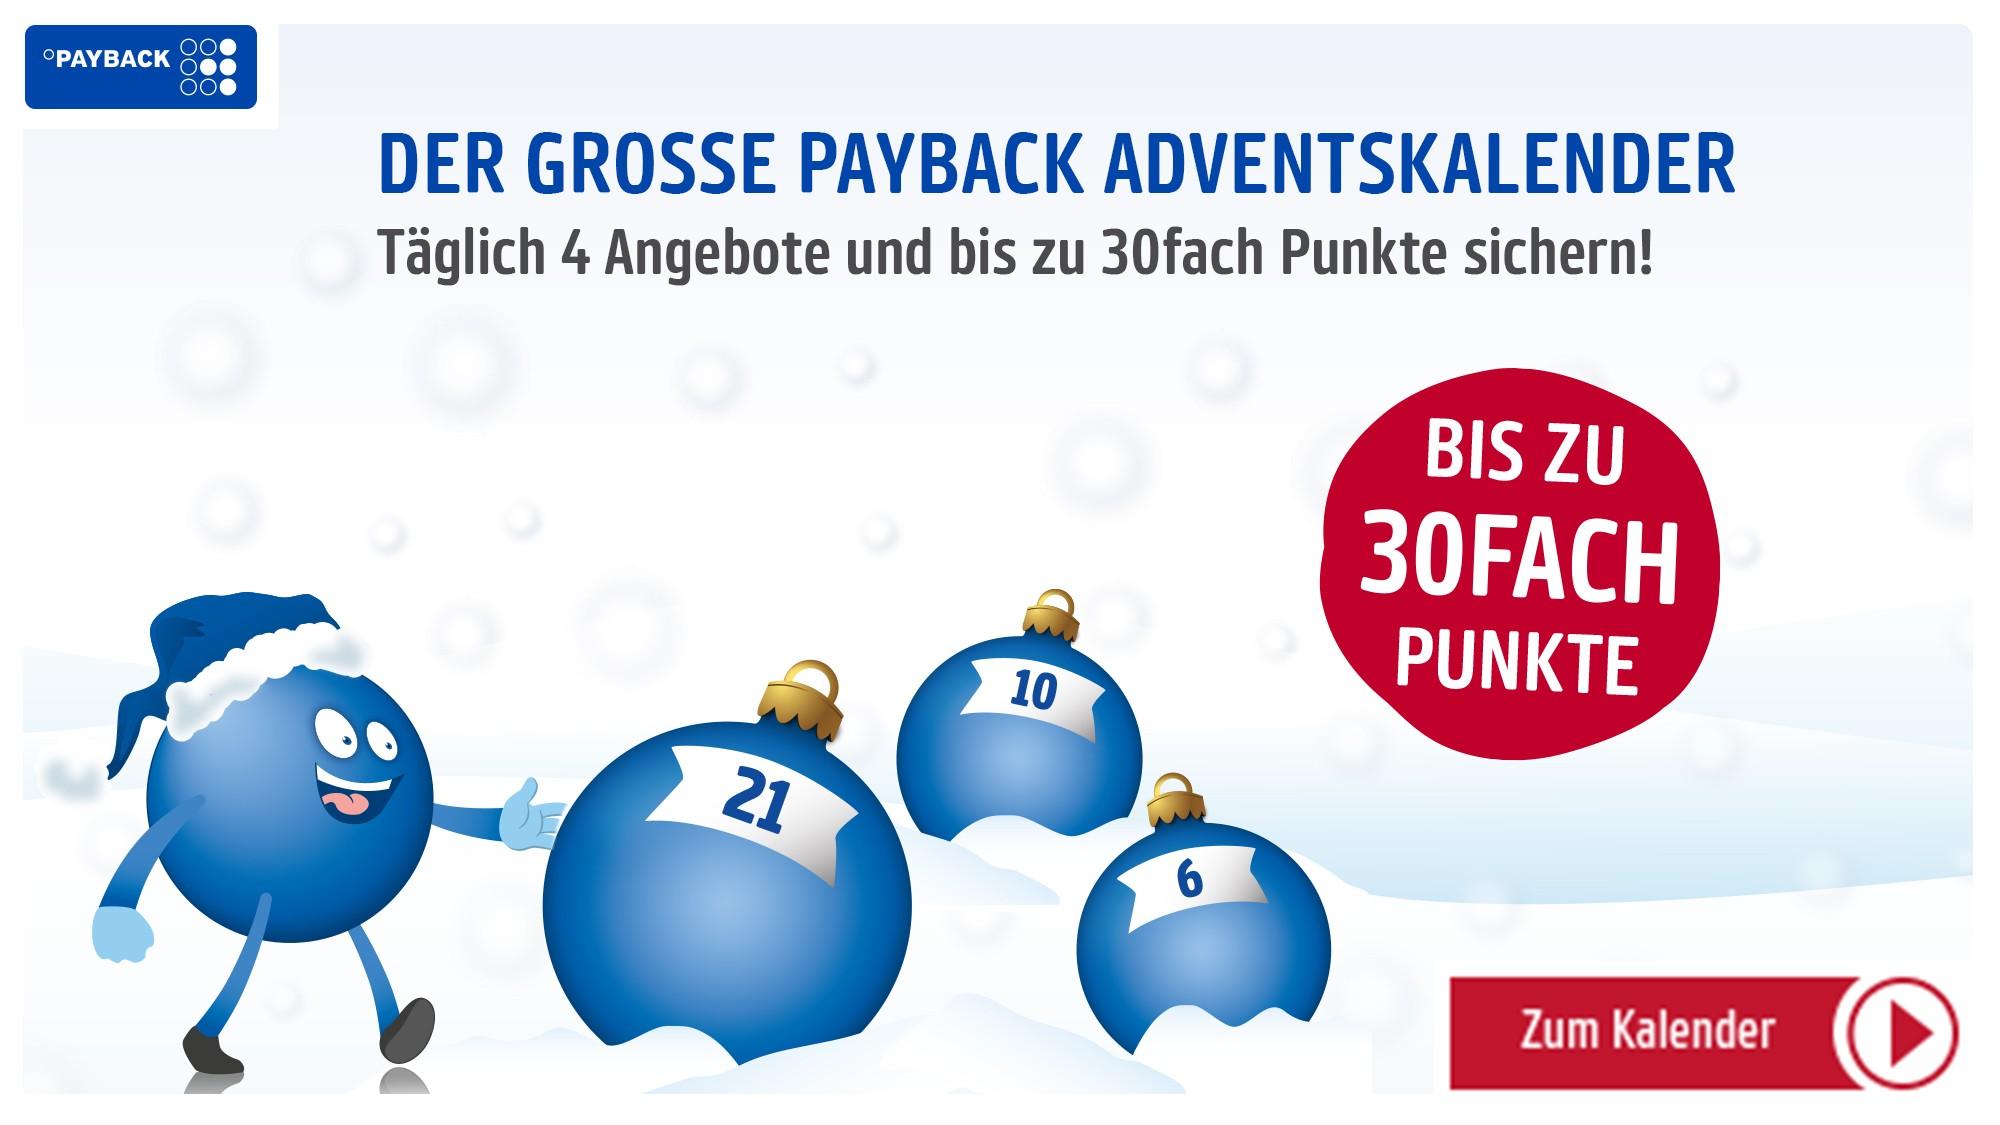 PAYBACK Teaser Adventskalender 2000x1125px